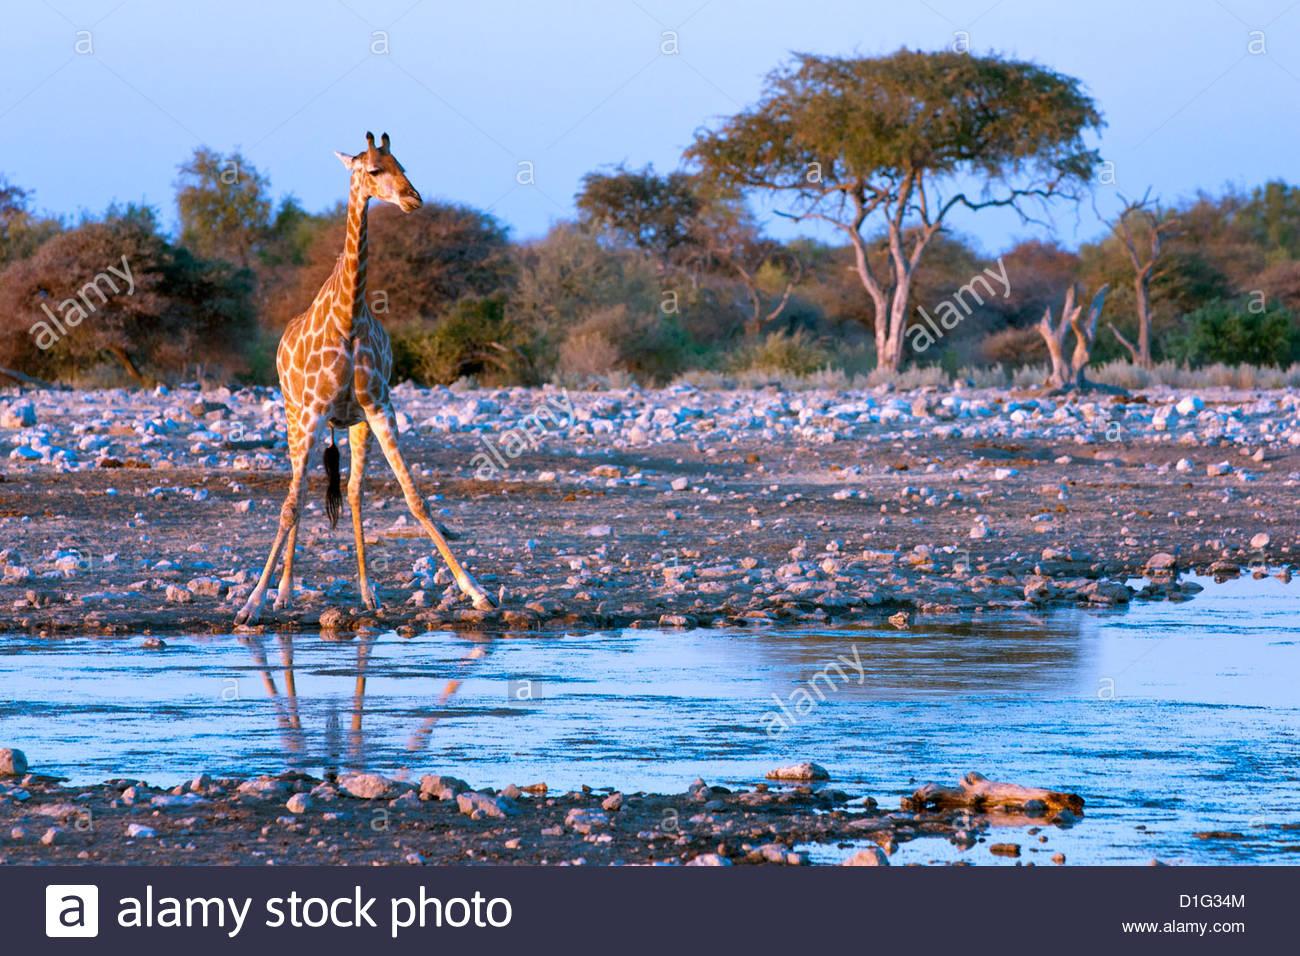 Giraffe (Giraffa camelopardis), Namibia, Africa Immagini Stock